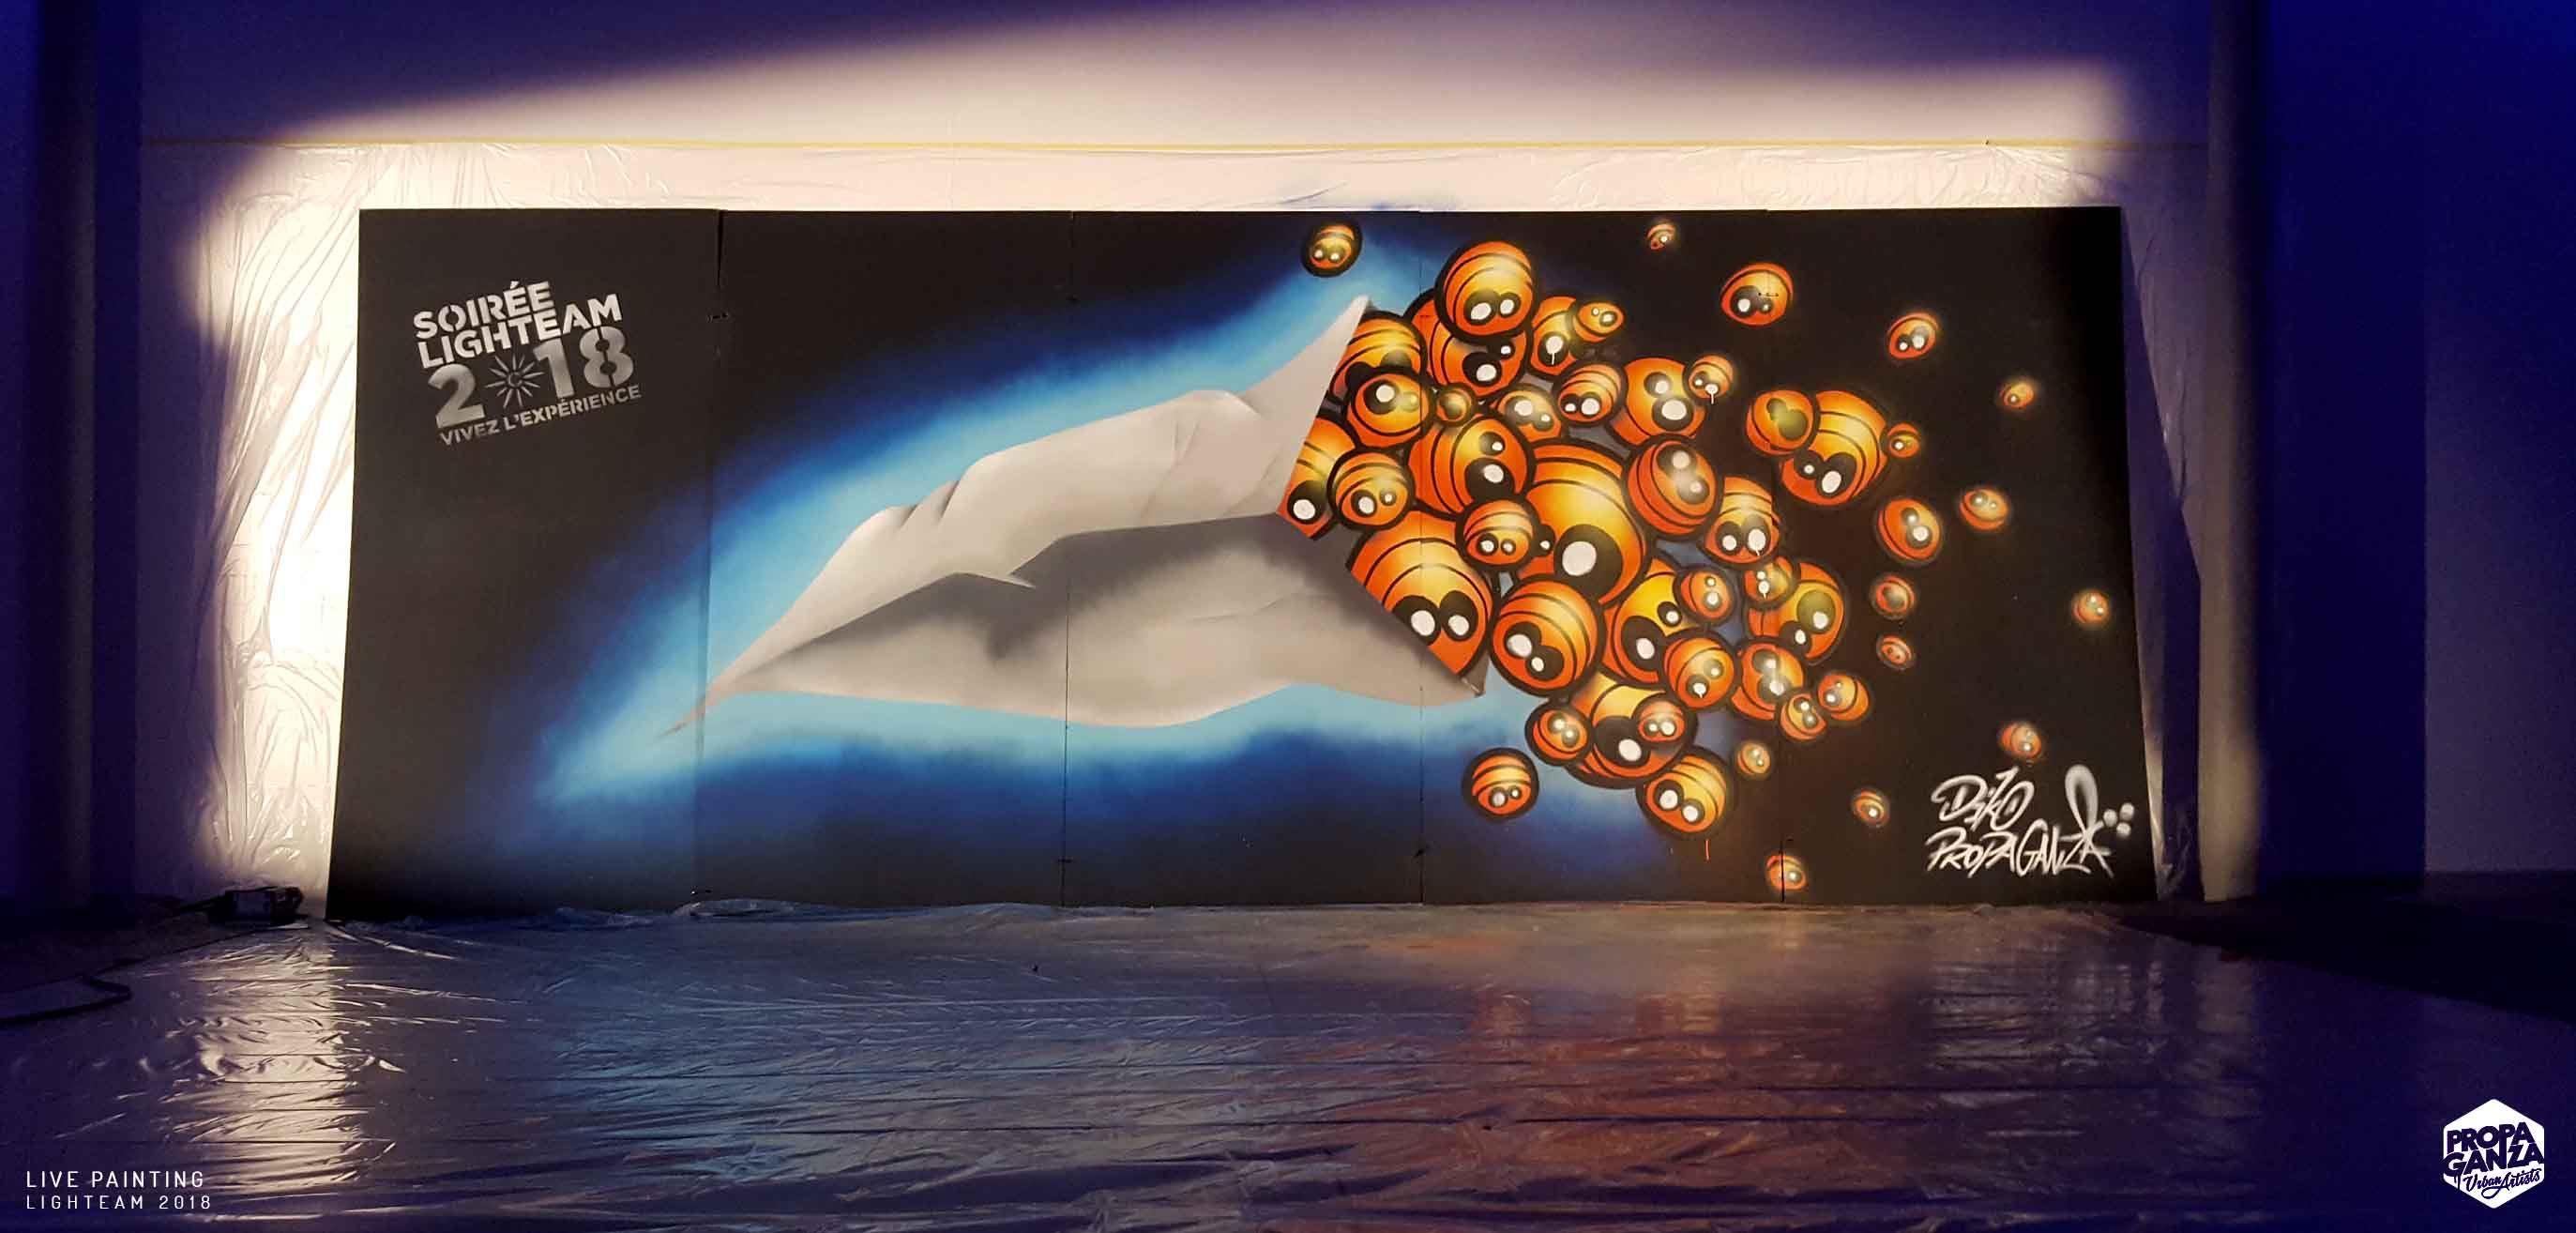 https://www.propaganza.be/wp-content/uploads/2019/04/propaganza-artistes-graffiti-street-art-bruxelles-belgique-belgium-painting-spraycan-spraypaint-fresque-2018-diko.jpg